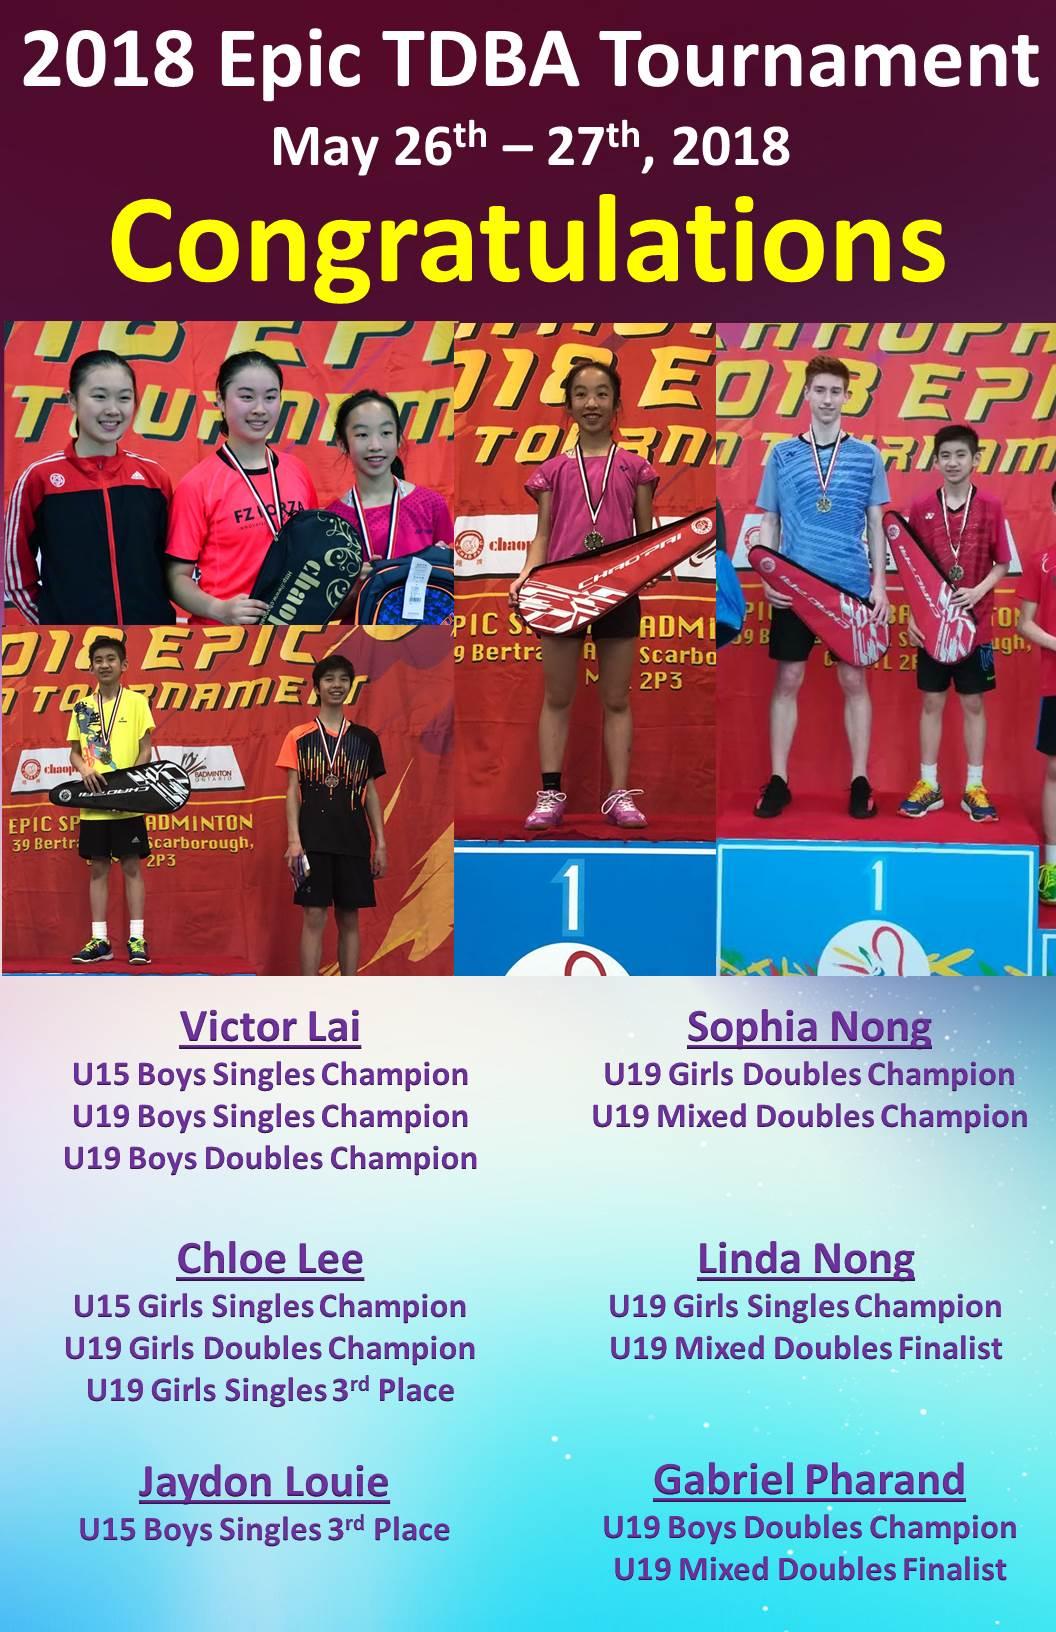 Epic TDBA Tournament May 26-27, 2018 (players)